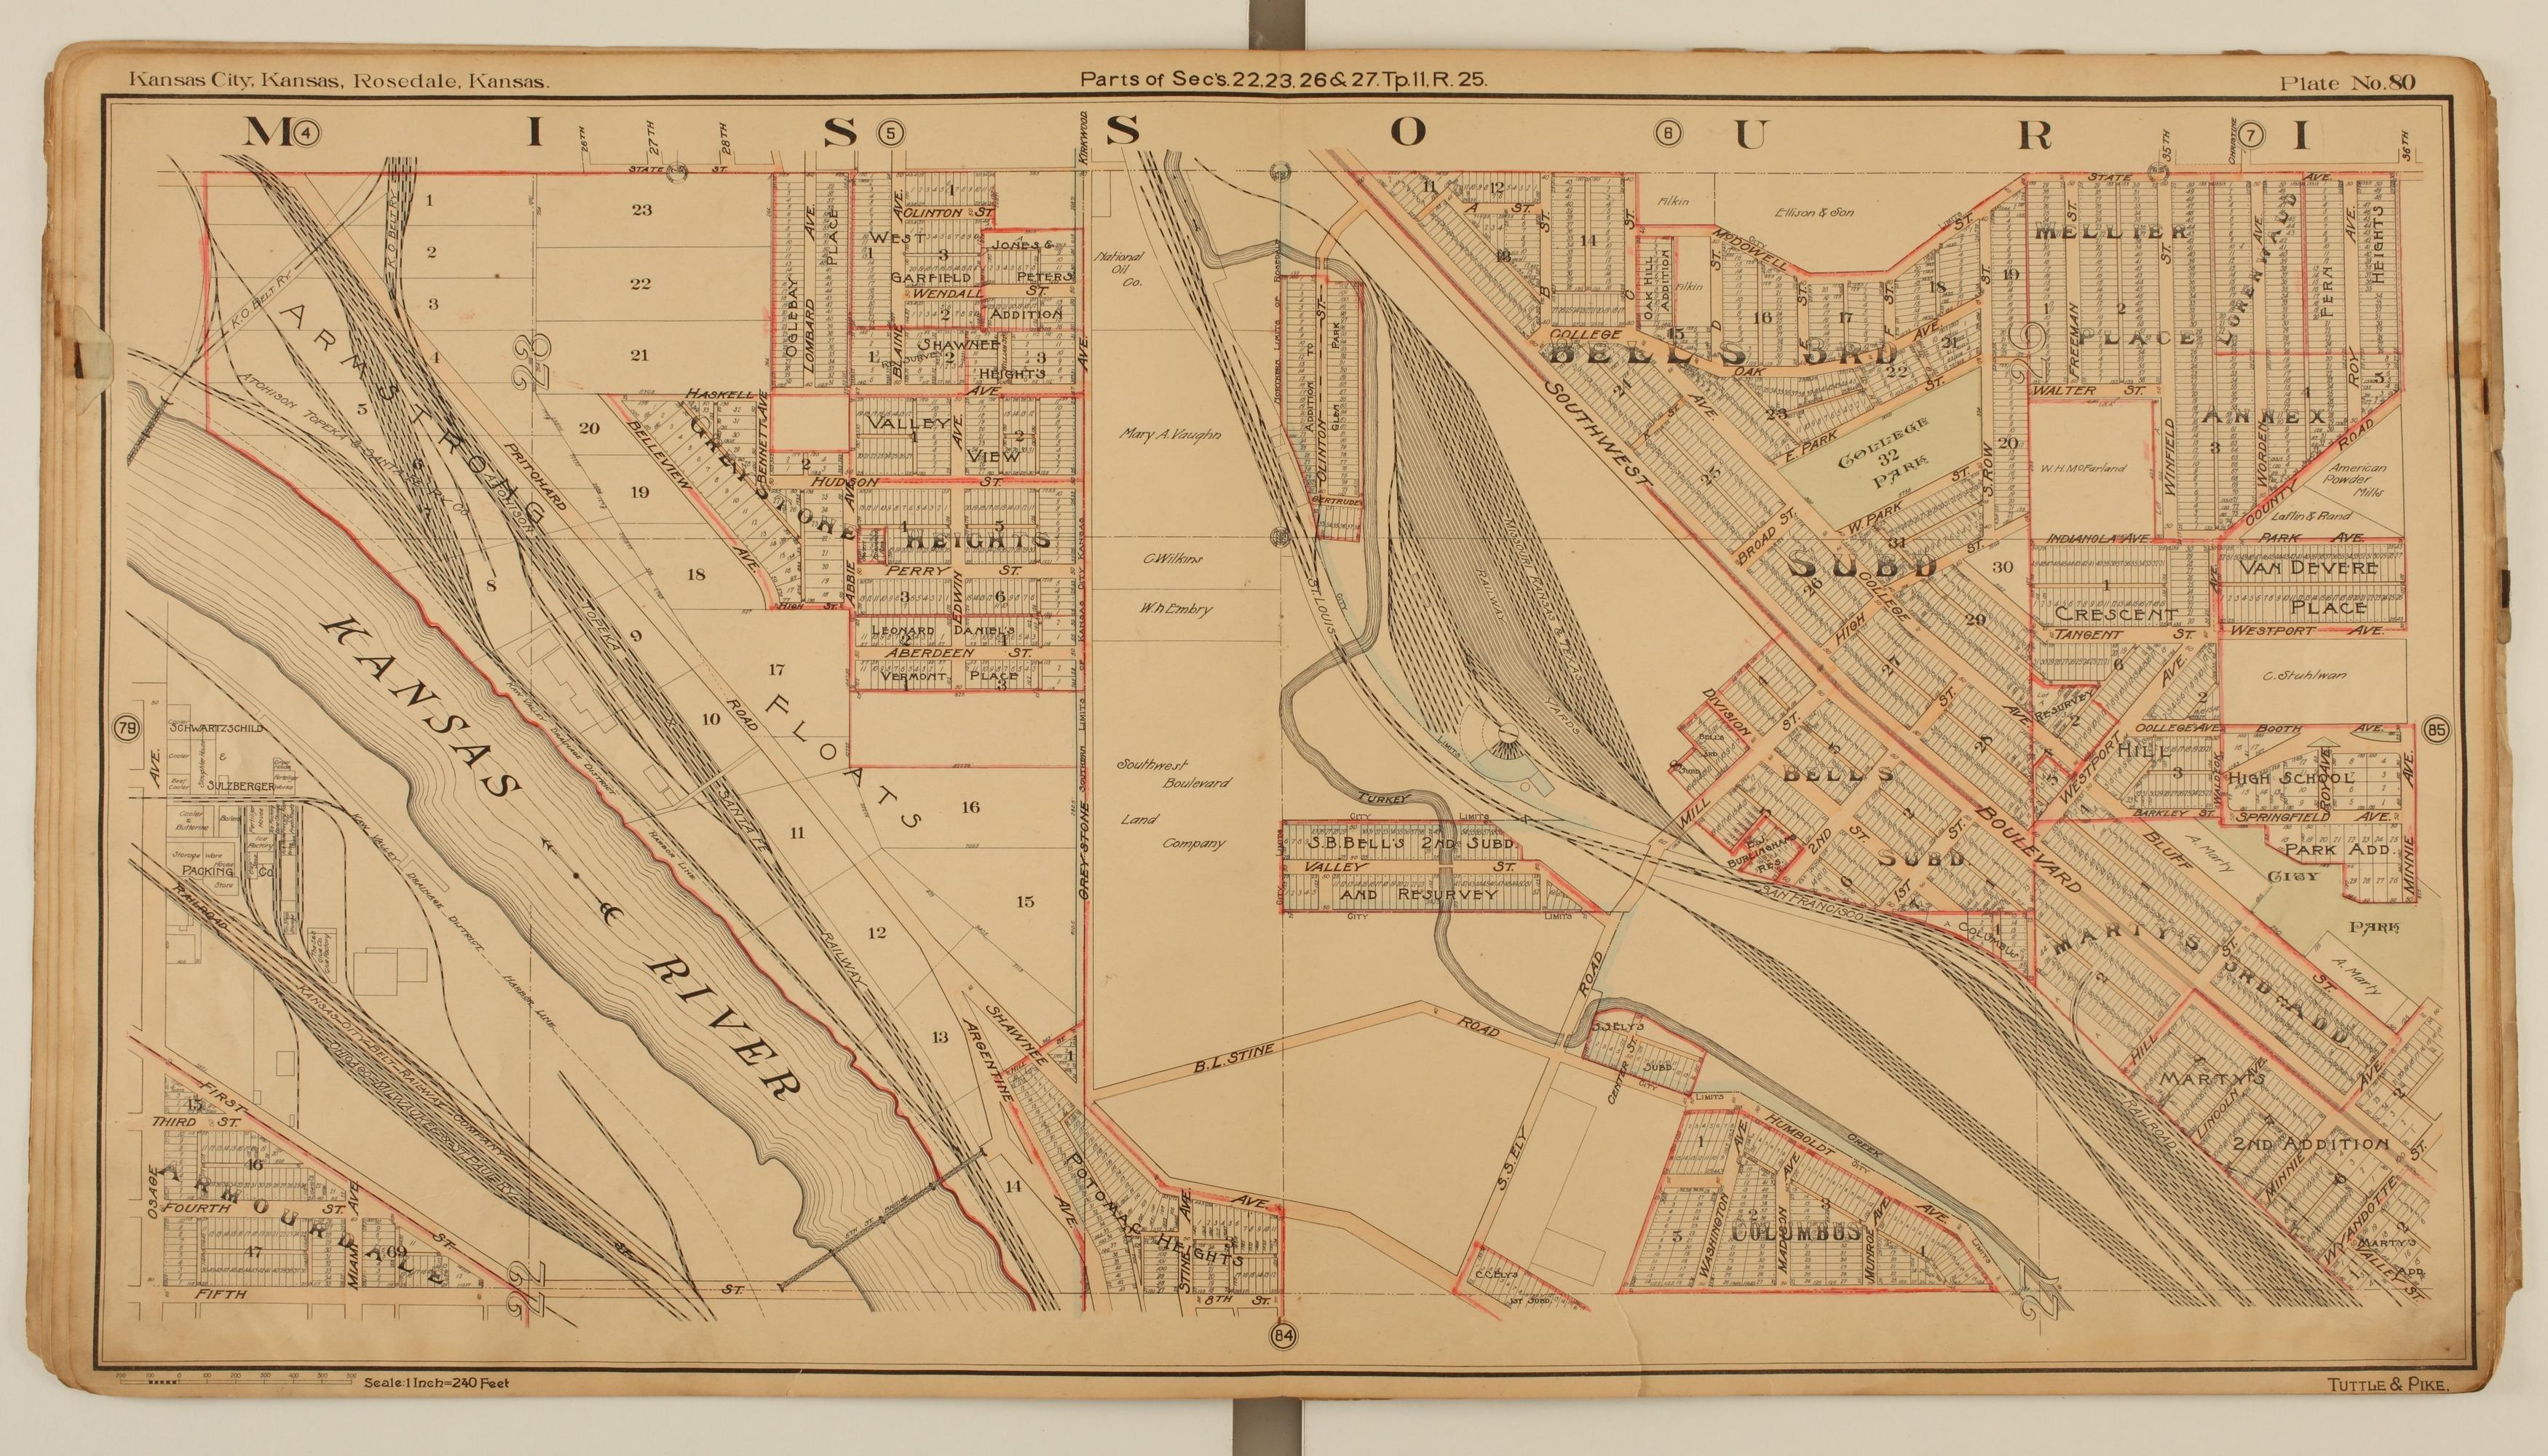 Tuttle and Pike's atlas of Kansas City, Kansas - 6